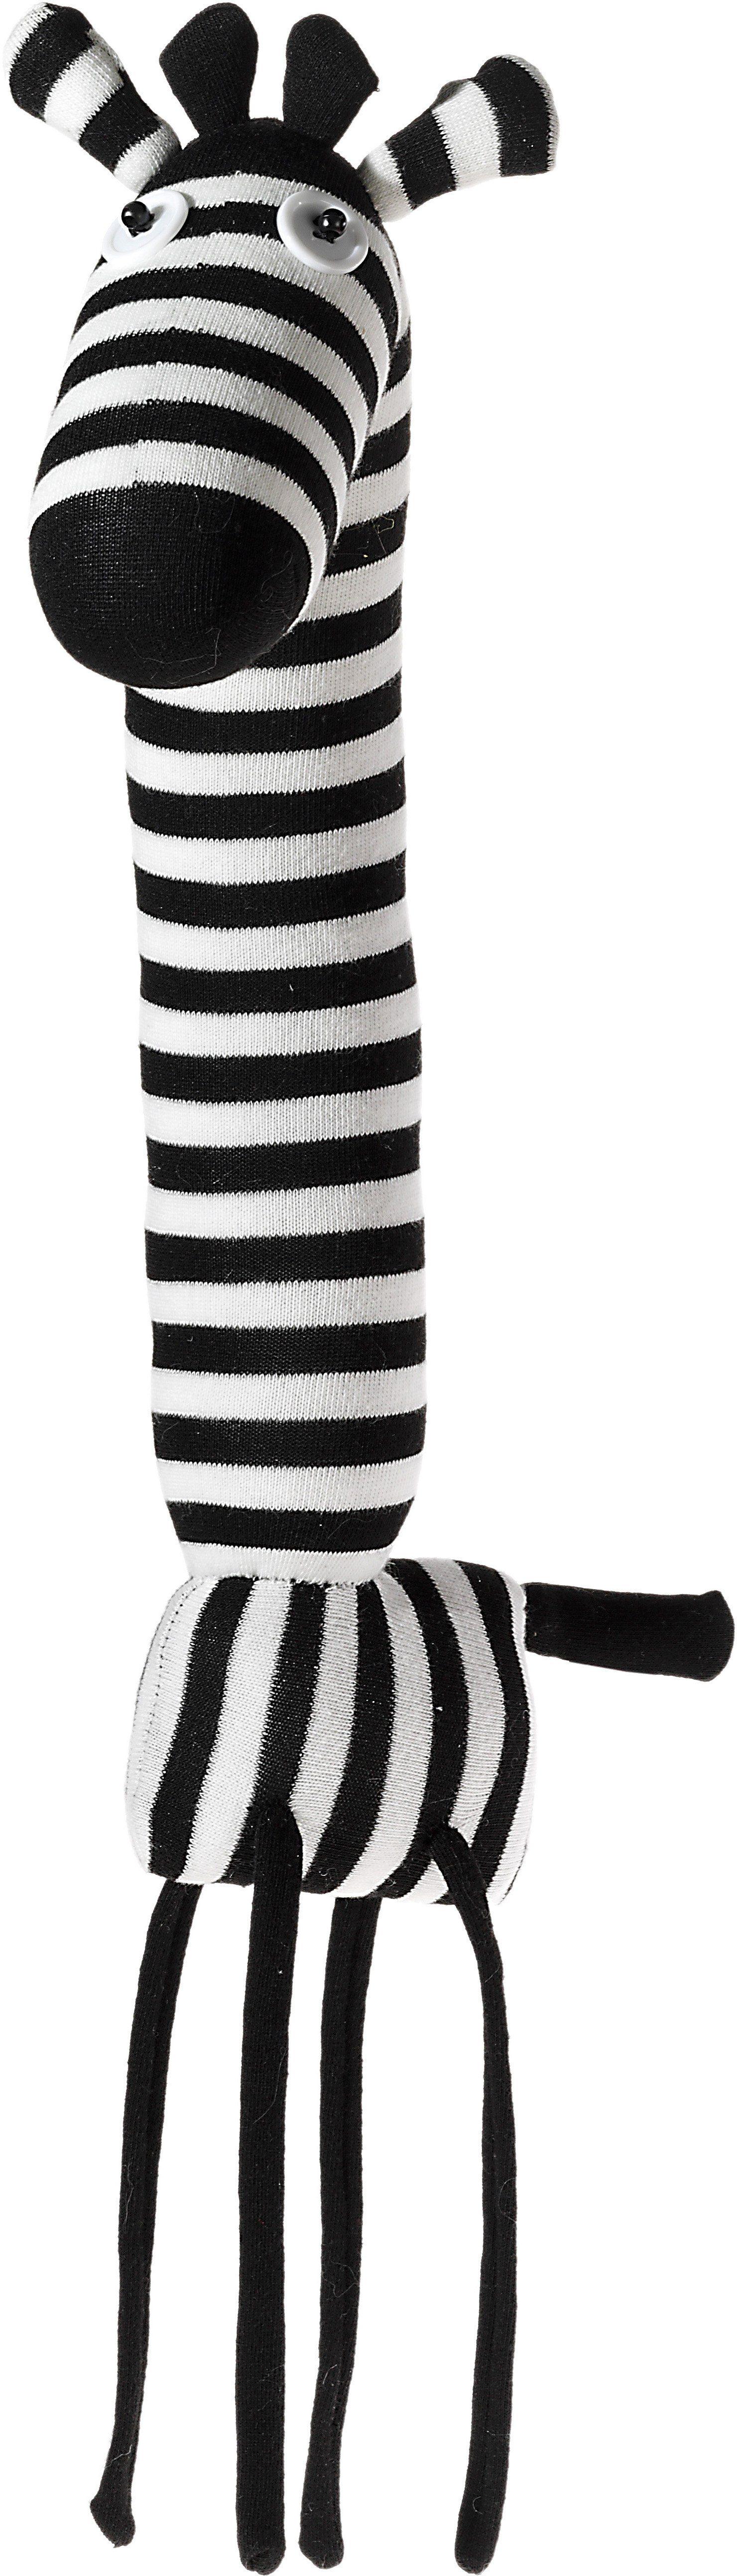 Heunec Kuscheltier, »Dolle Socke Zebra XL«